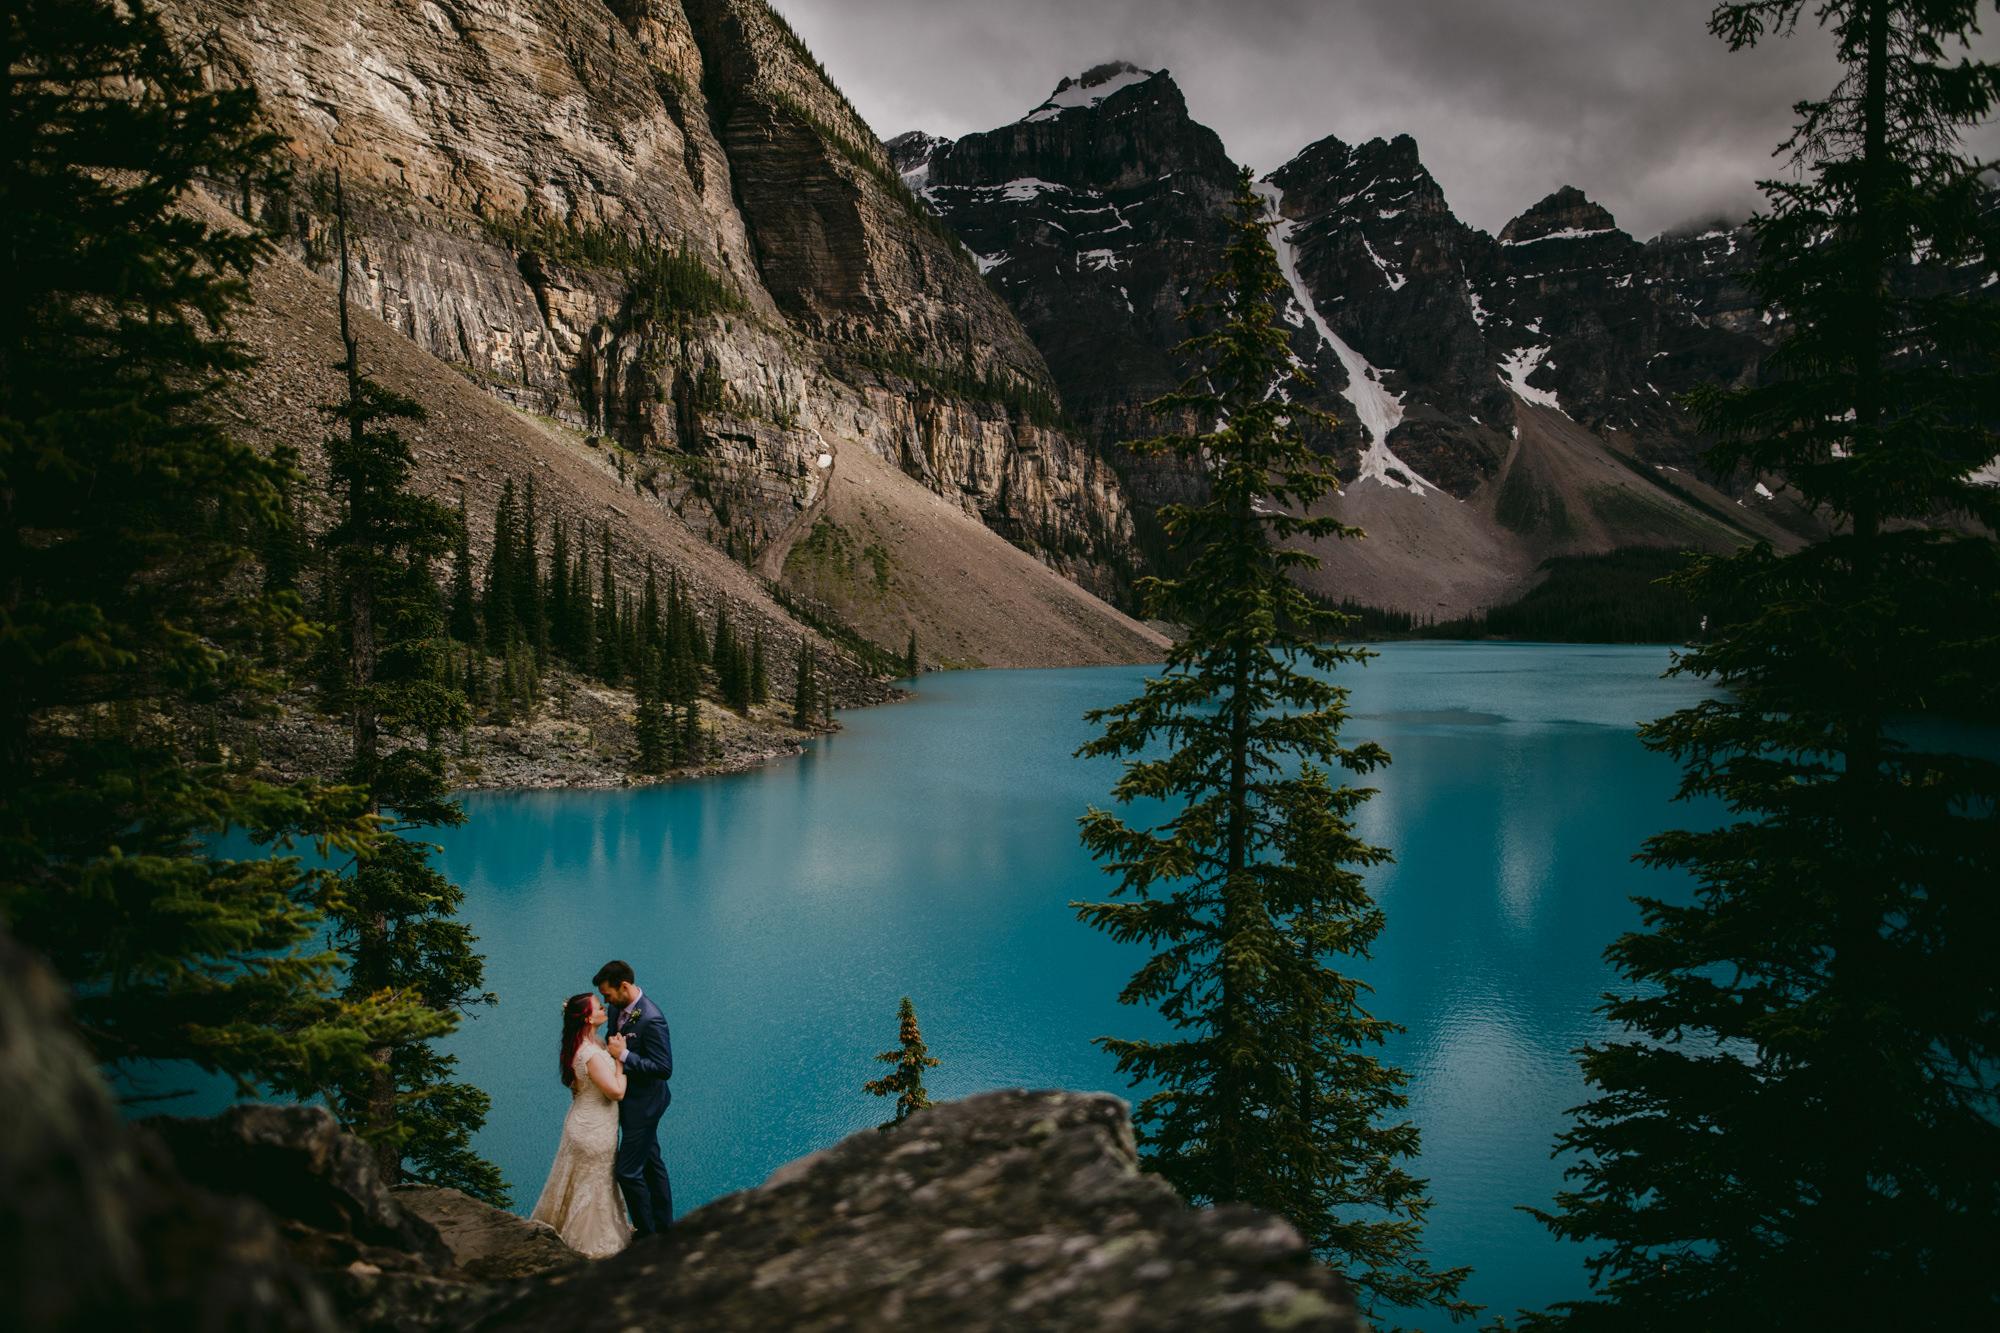 Couple portrait at Lake Moraine by Gabe McClintock